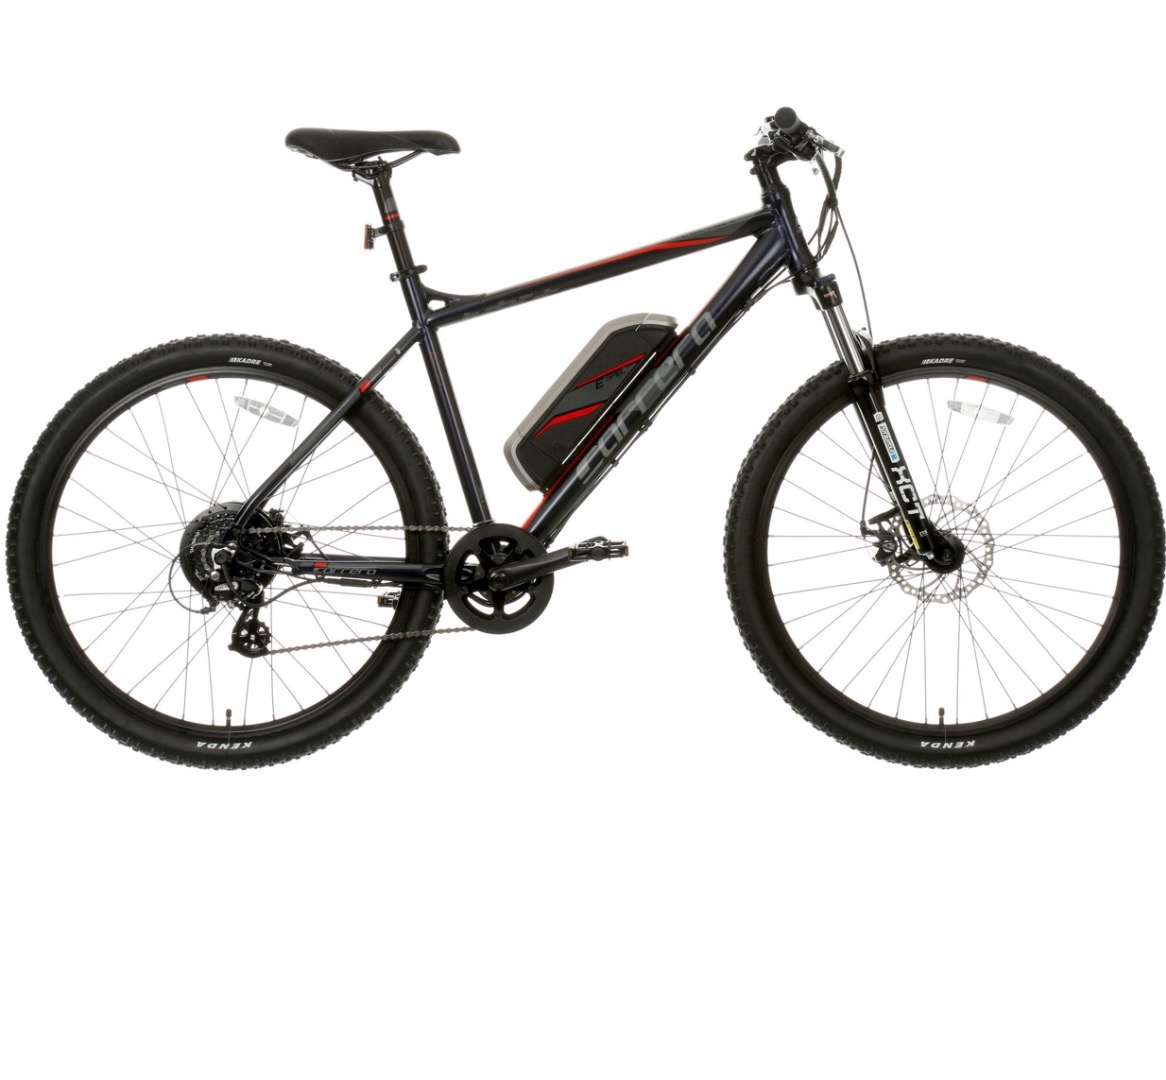 Stolen Carrera bicycles Vengeance-E